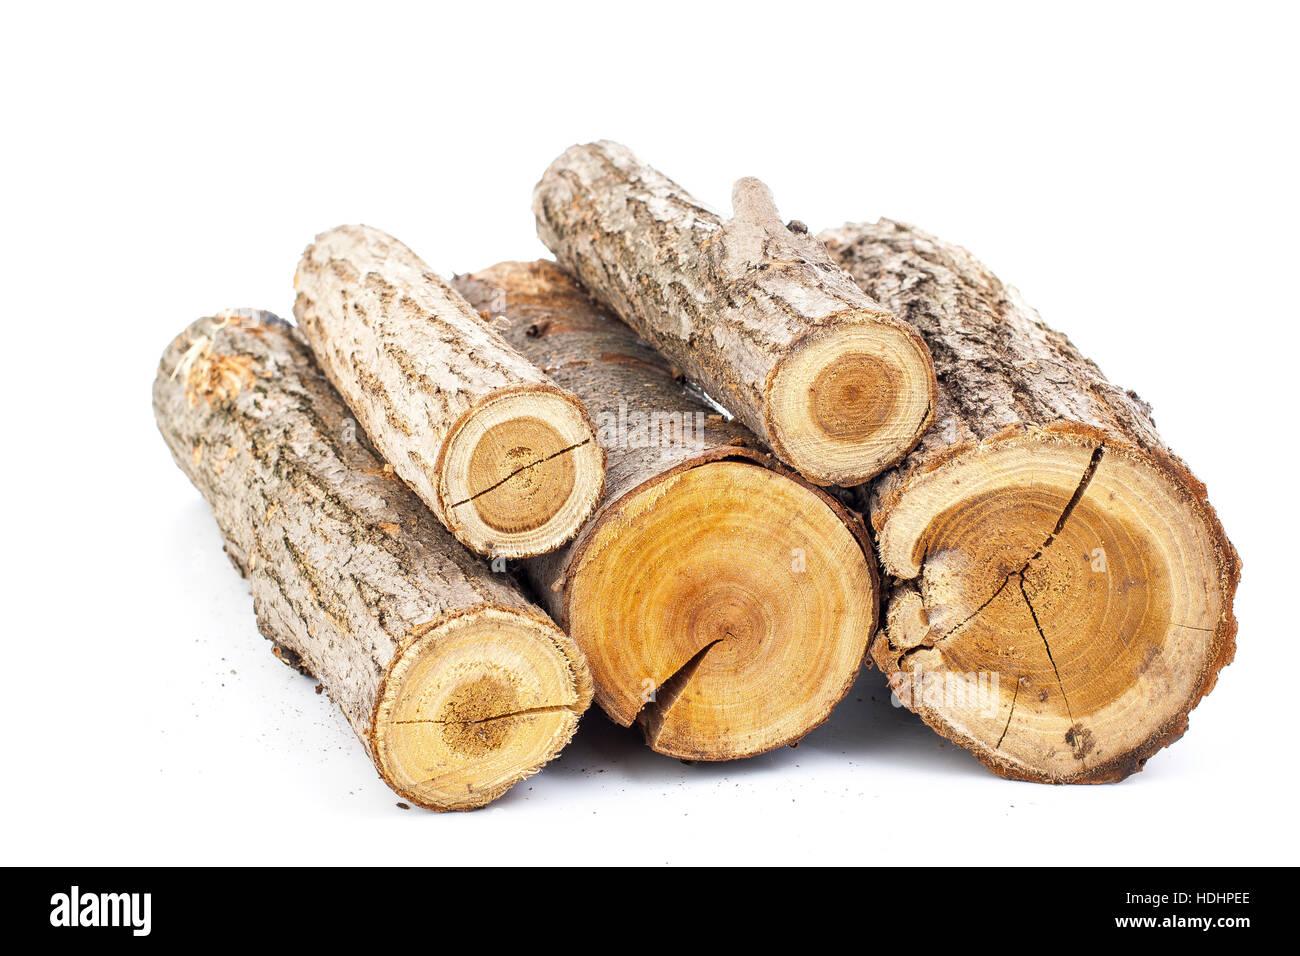 Pine logs on white background studio photo split wood